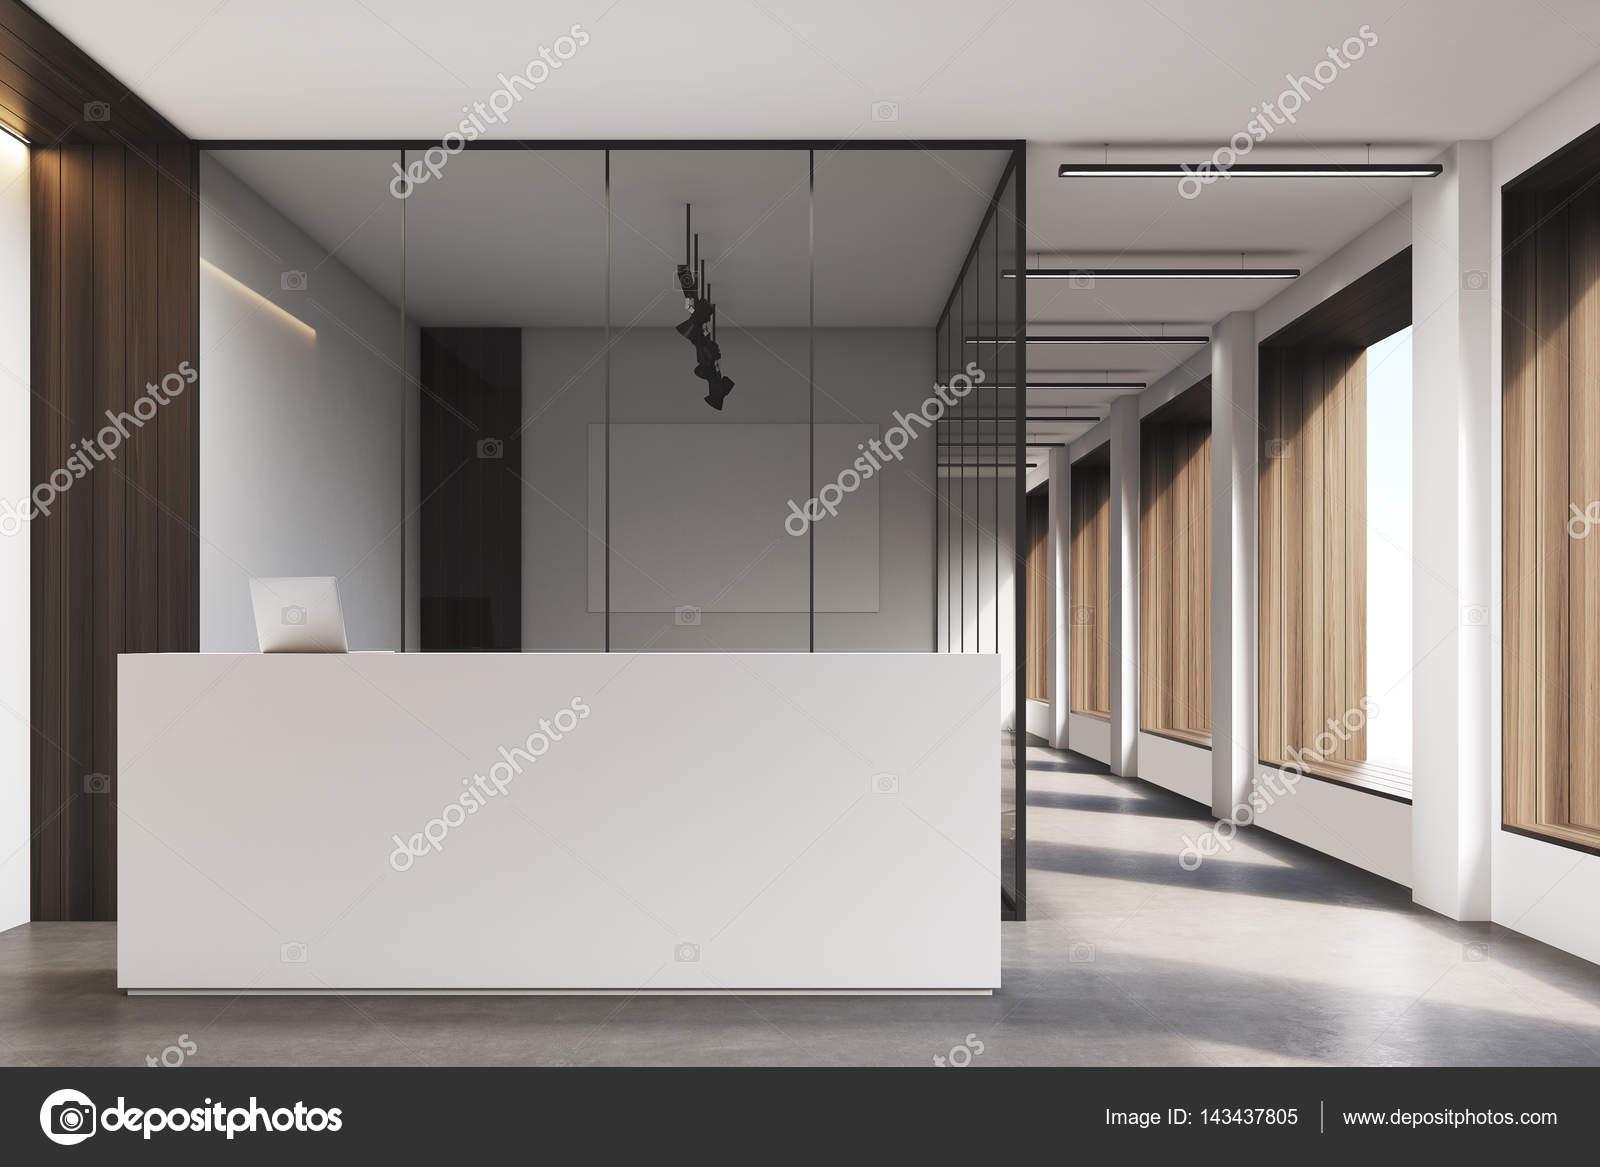 Büro-Lobby, sauber und hell, dunkel — Stockfoto © denisismagilov ...